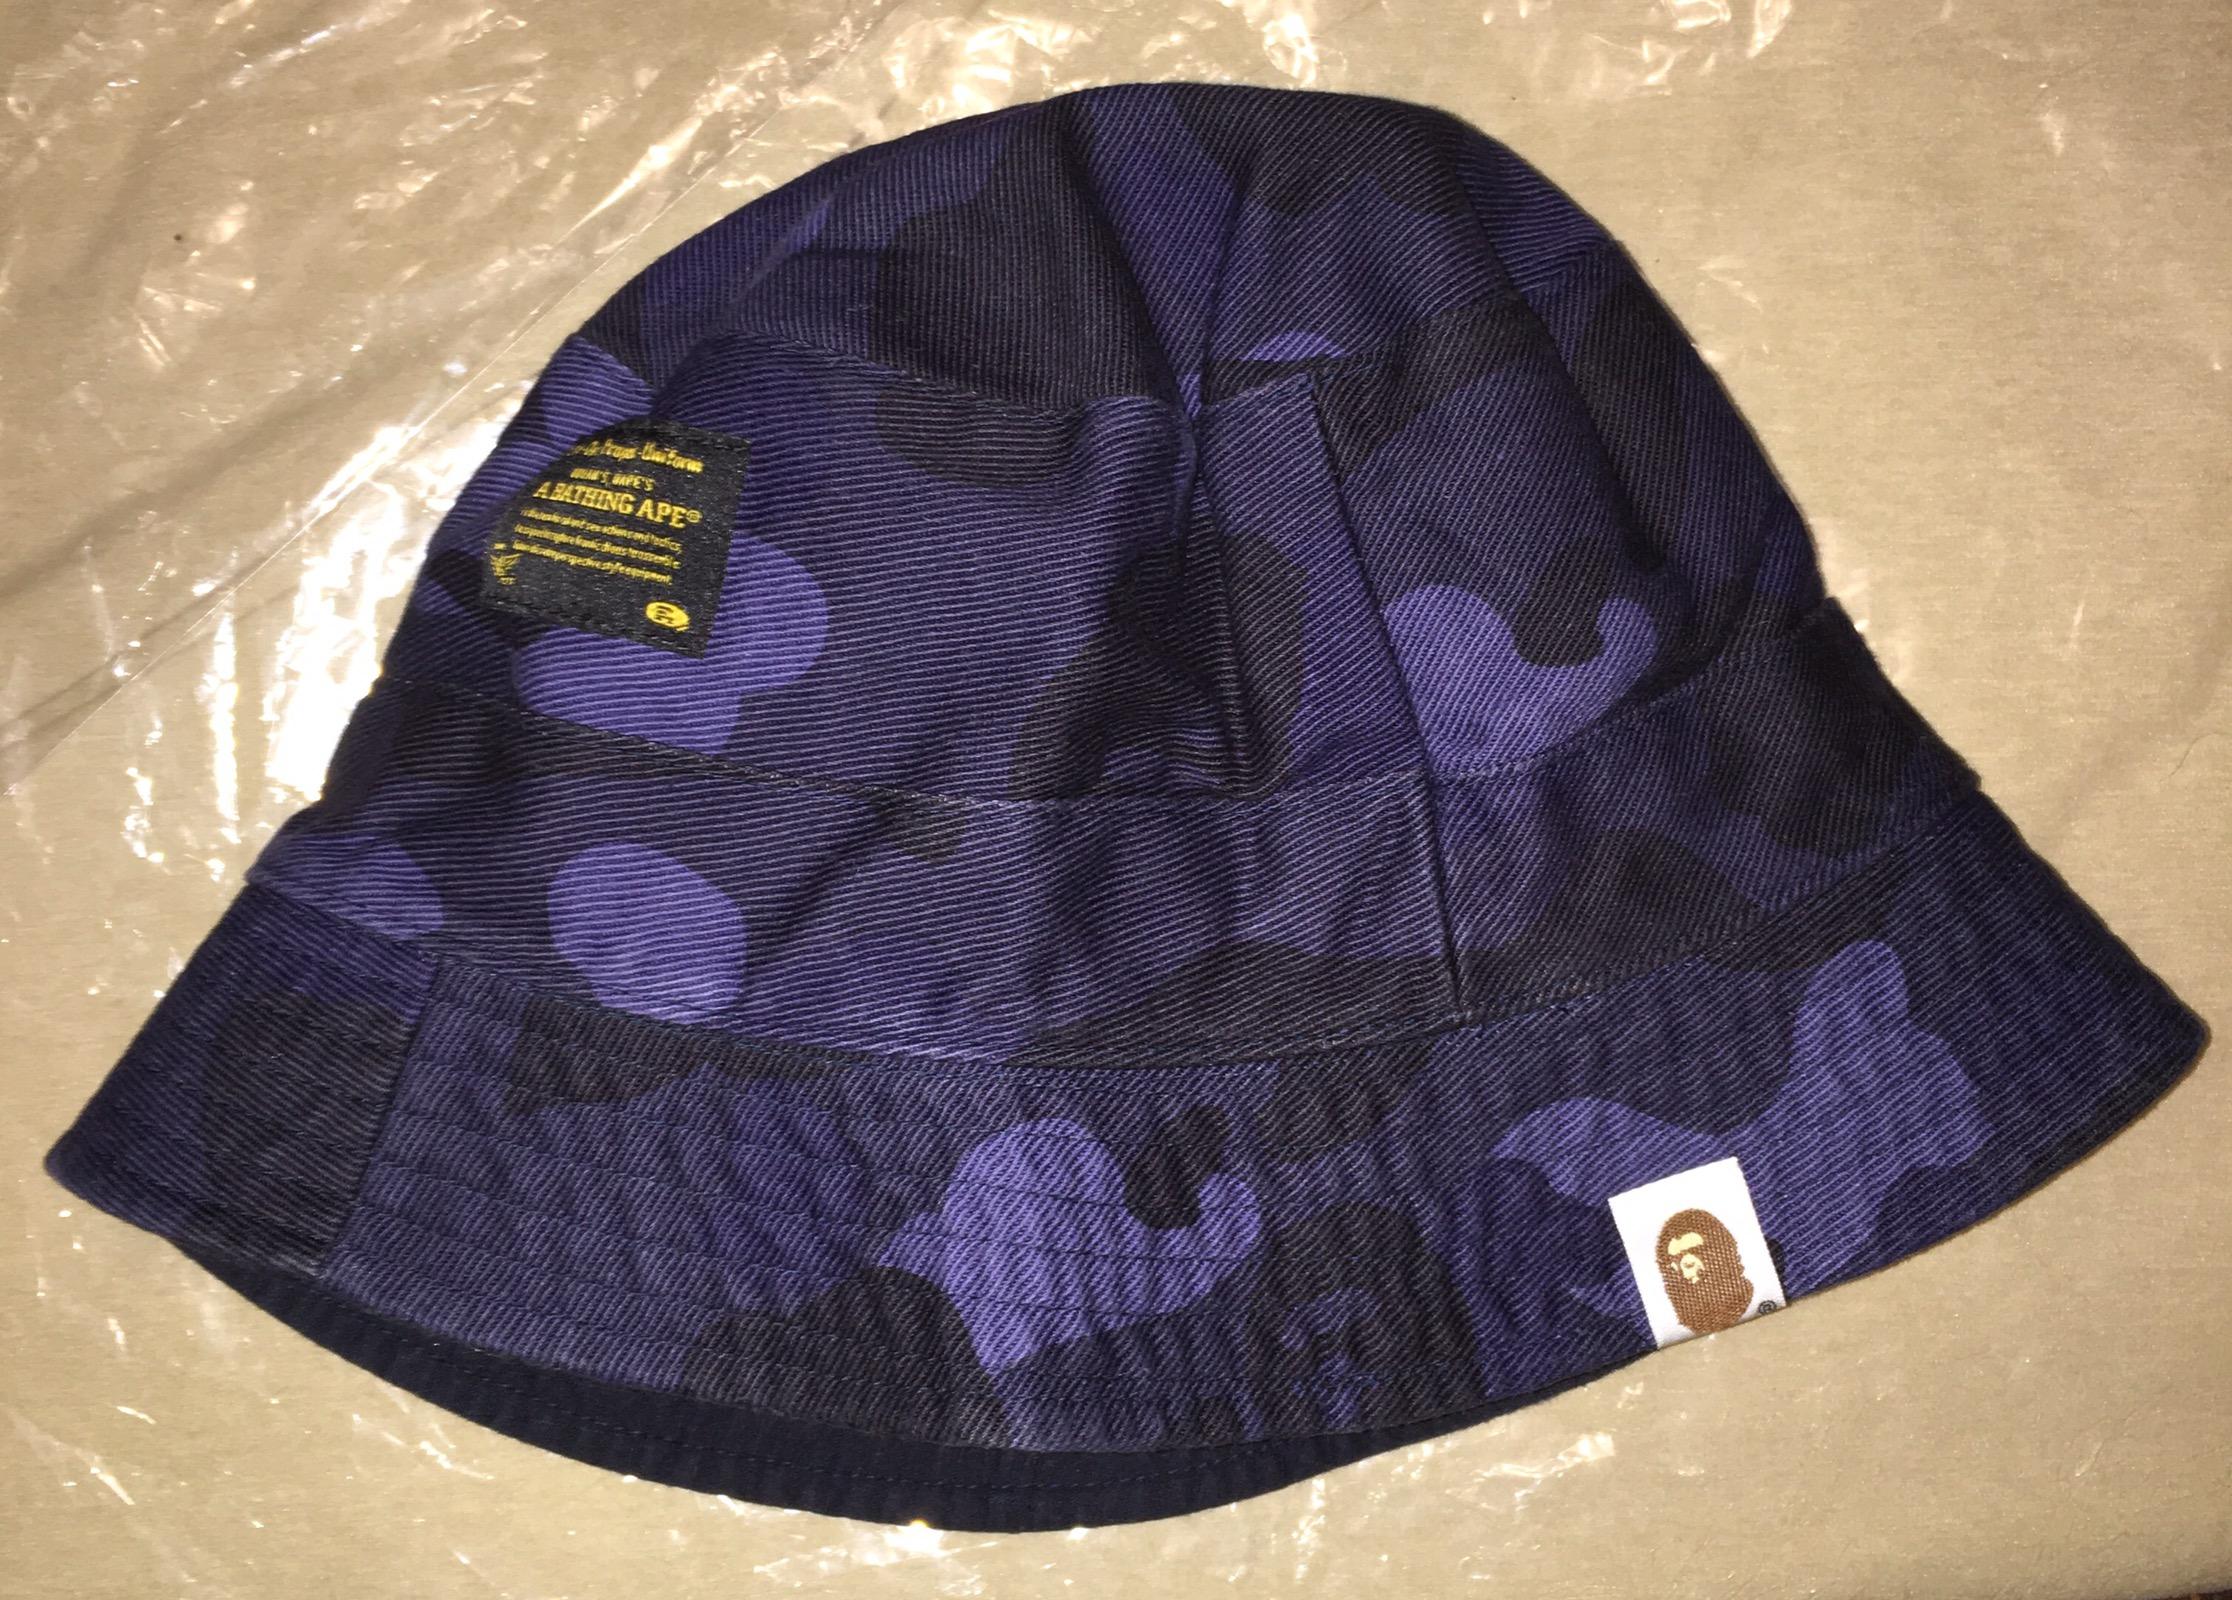 1295c6f7 Bape Bape Blue Camo Reversible Bucket Hat | Grailed